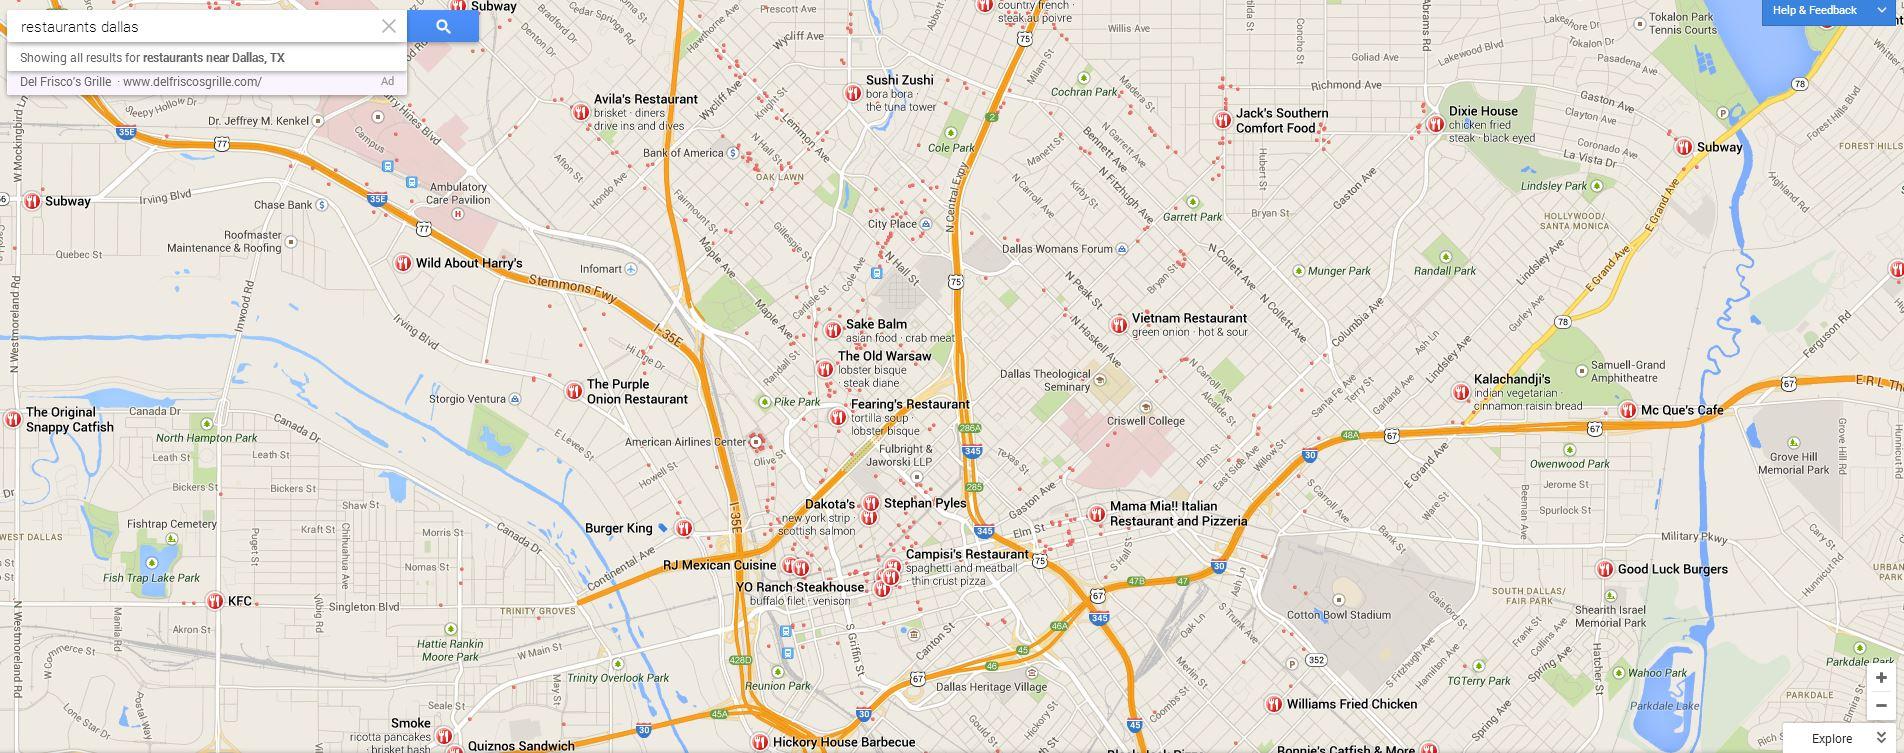 Google Maps-restaurants in Dallas